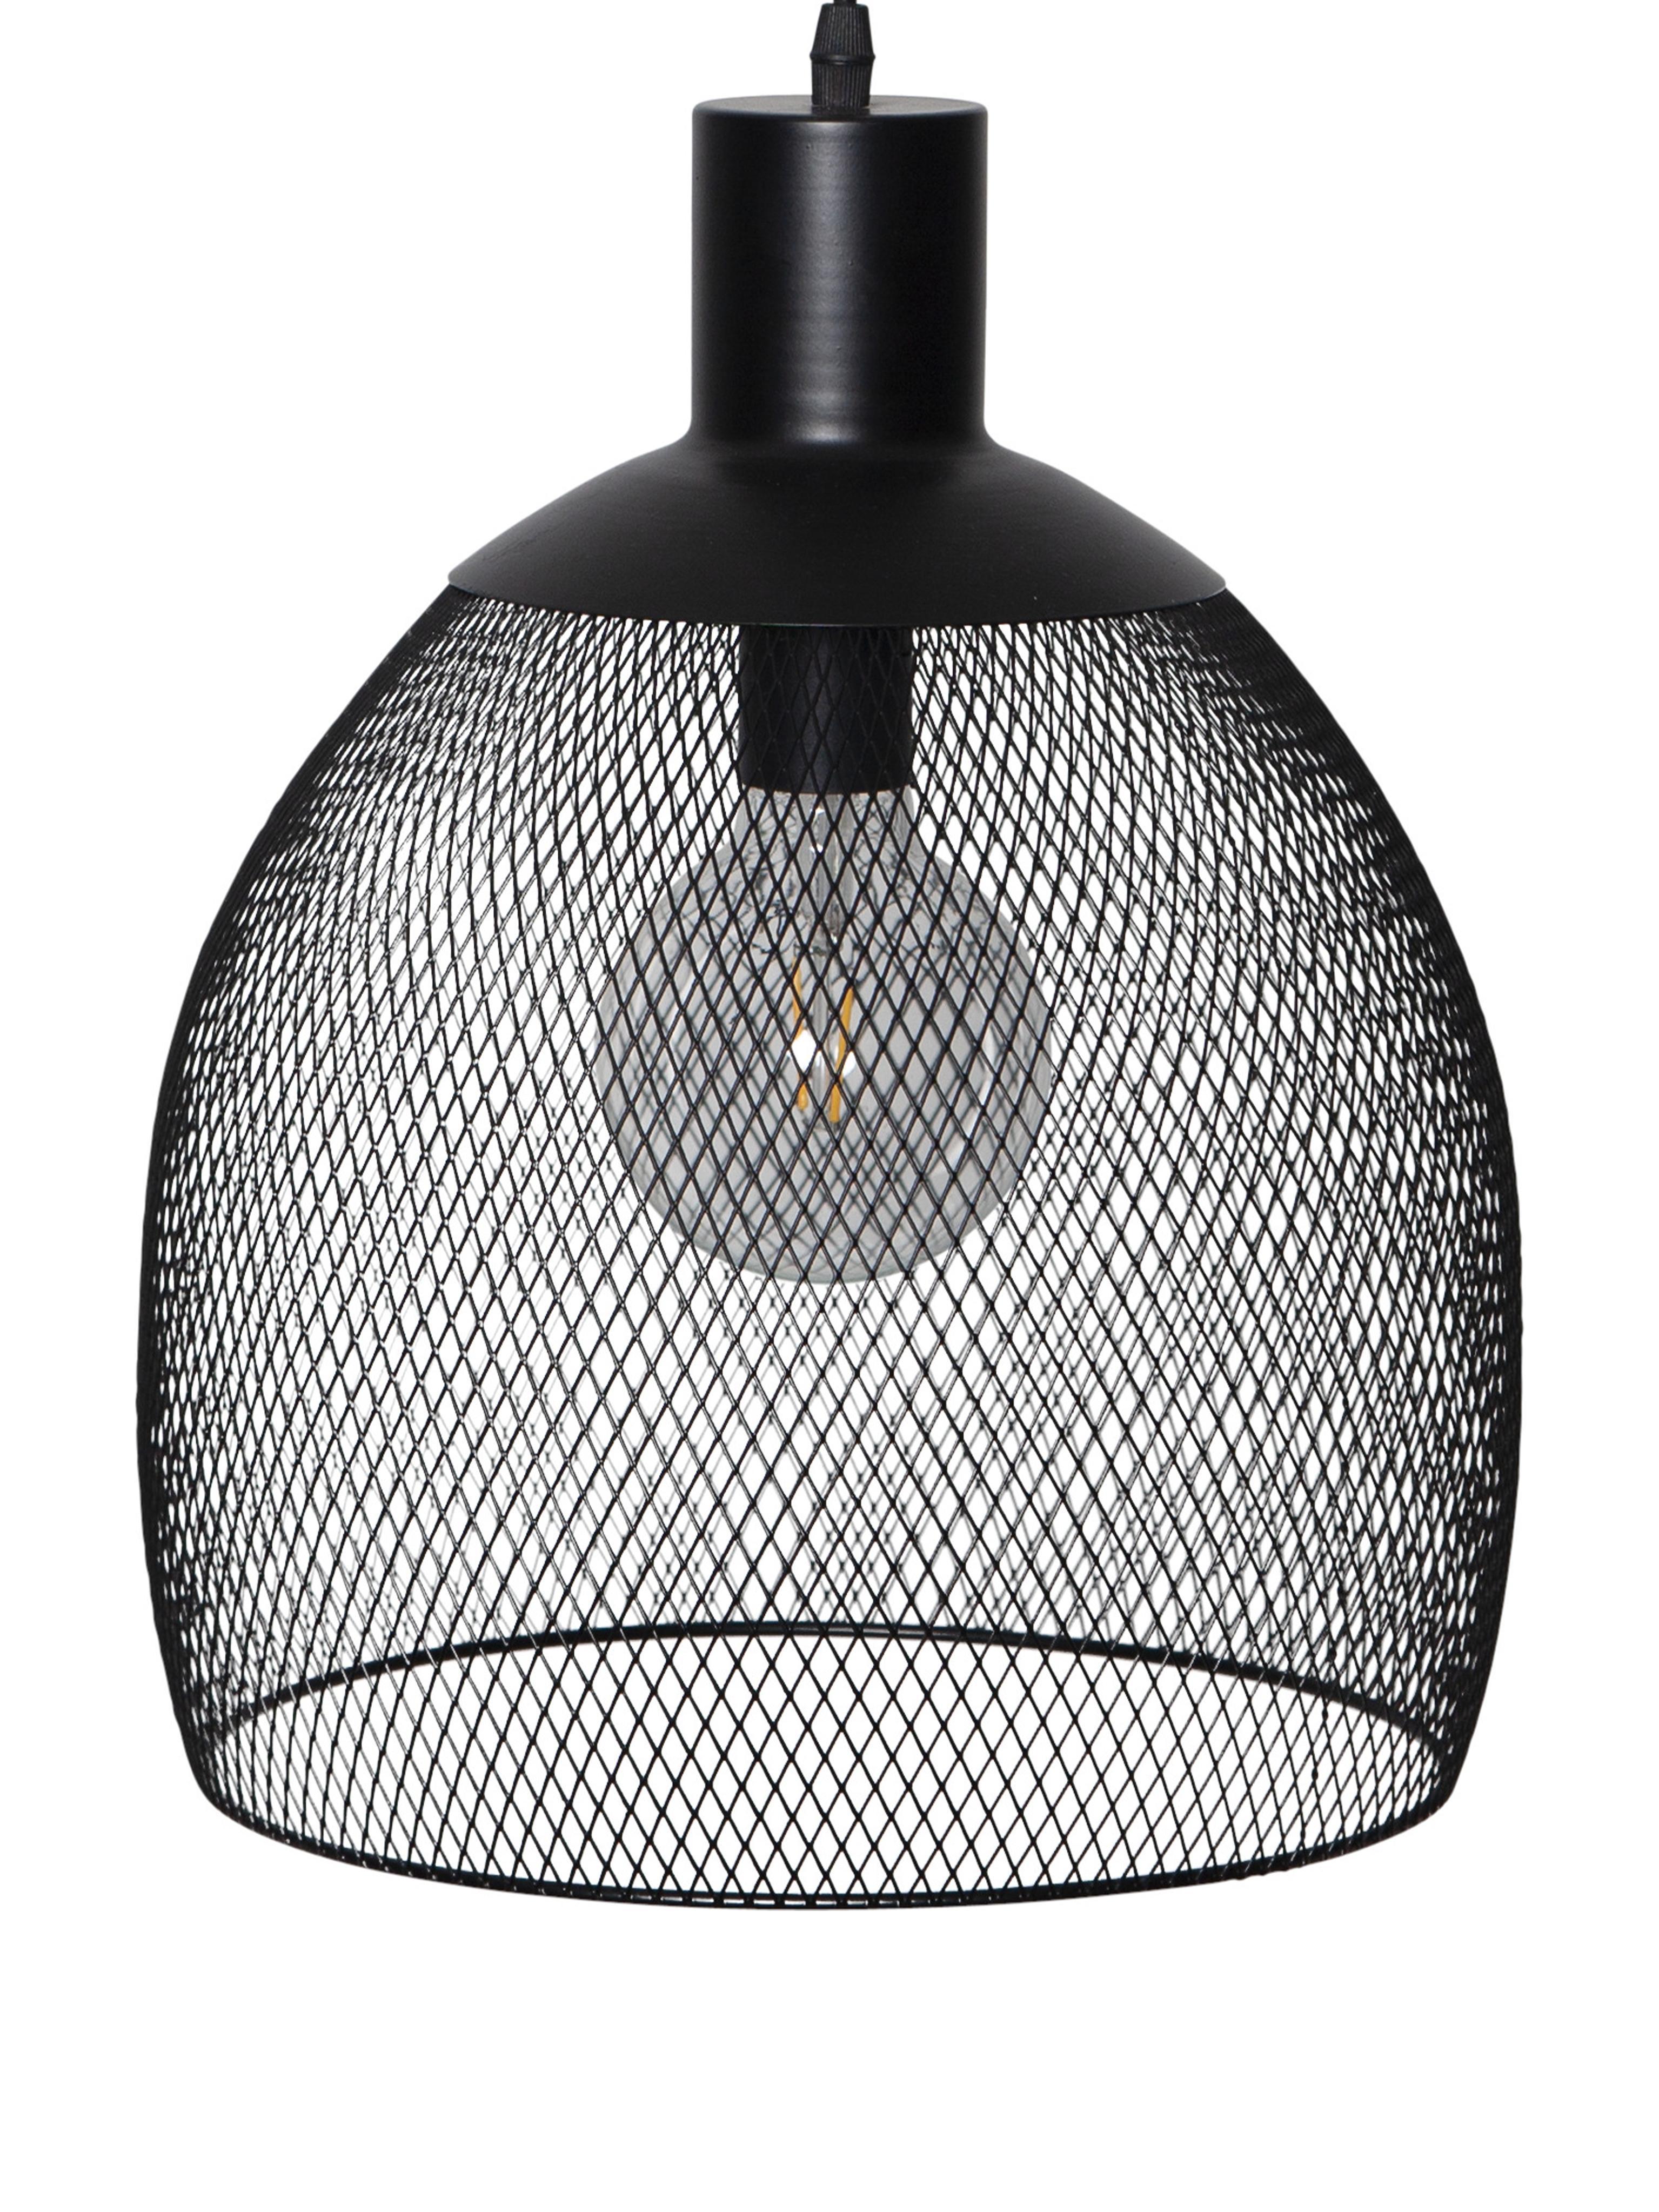 Lámpara solar LED Sunlight, Negro, Ø 29 x Al 35 cm